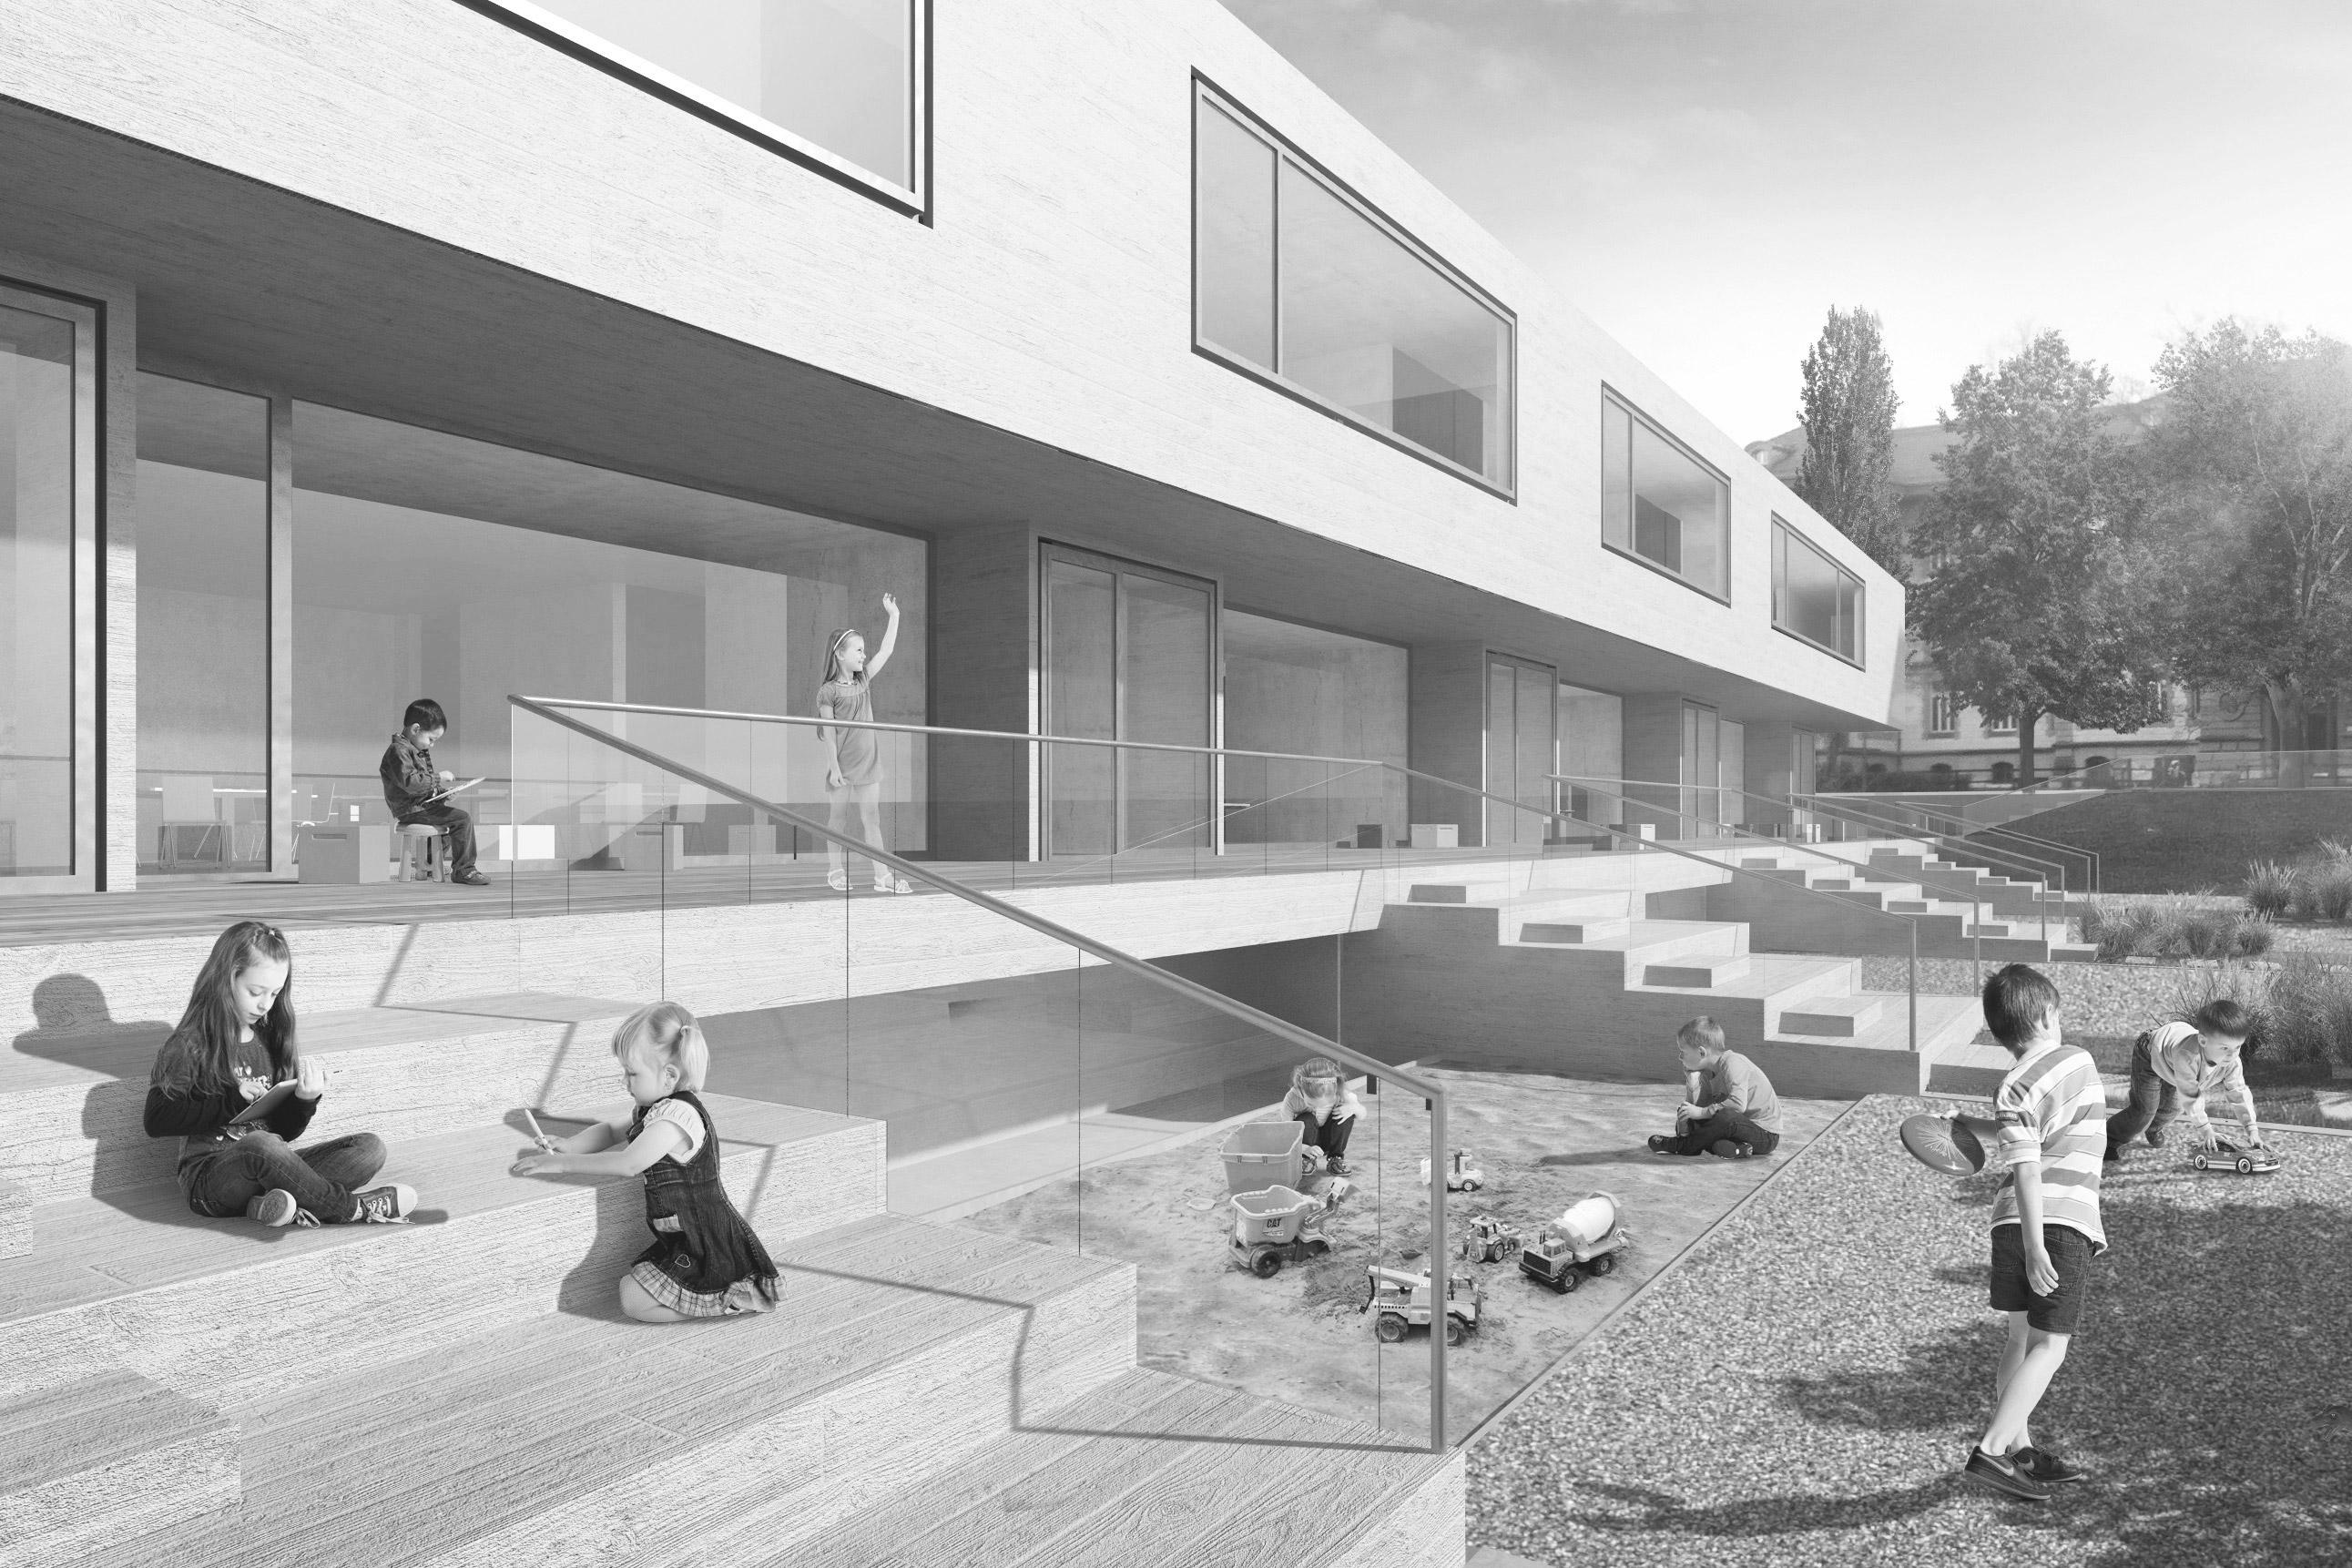 Volksschule Kirchenfeld Bern, Schweiz, Schenker Salvi Weber, Wettbewerb, Visualisierung, Aussenraum